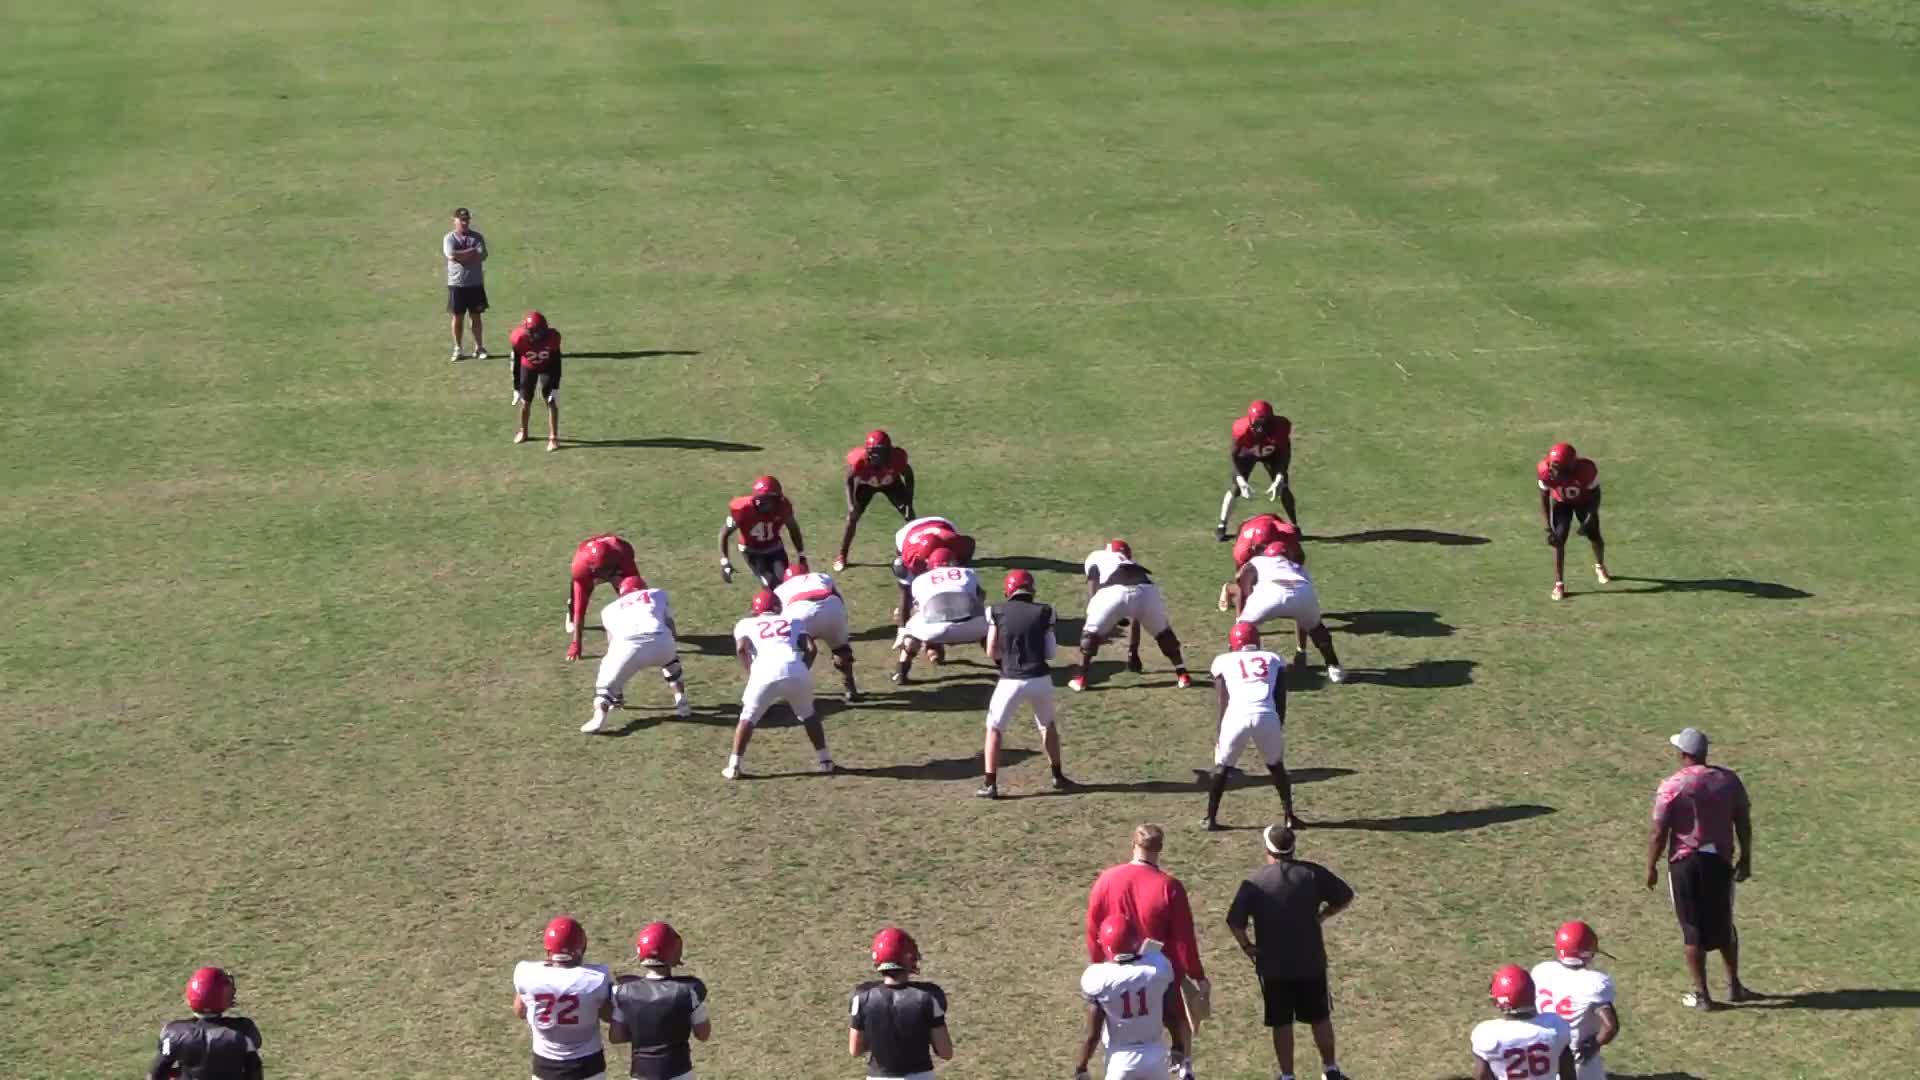 '21 Spring Practice Offense